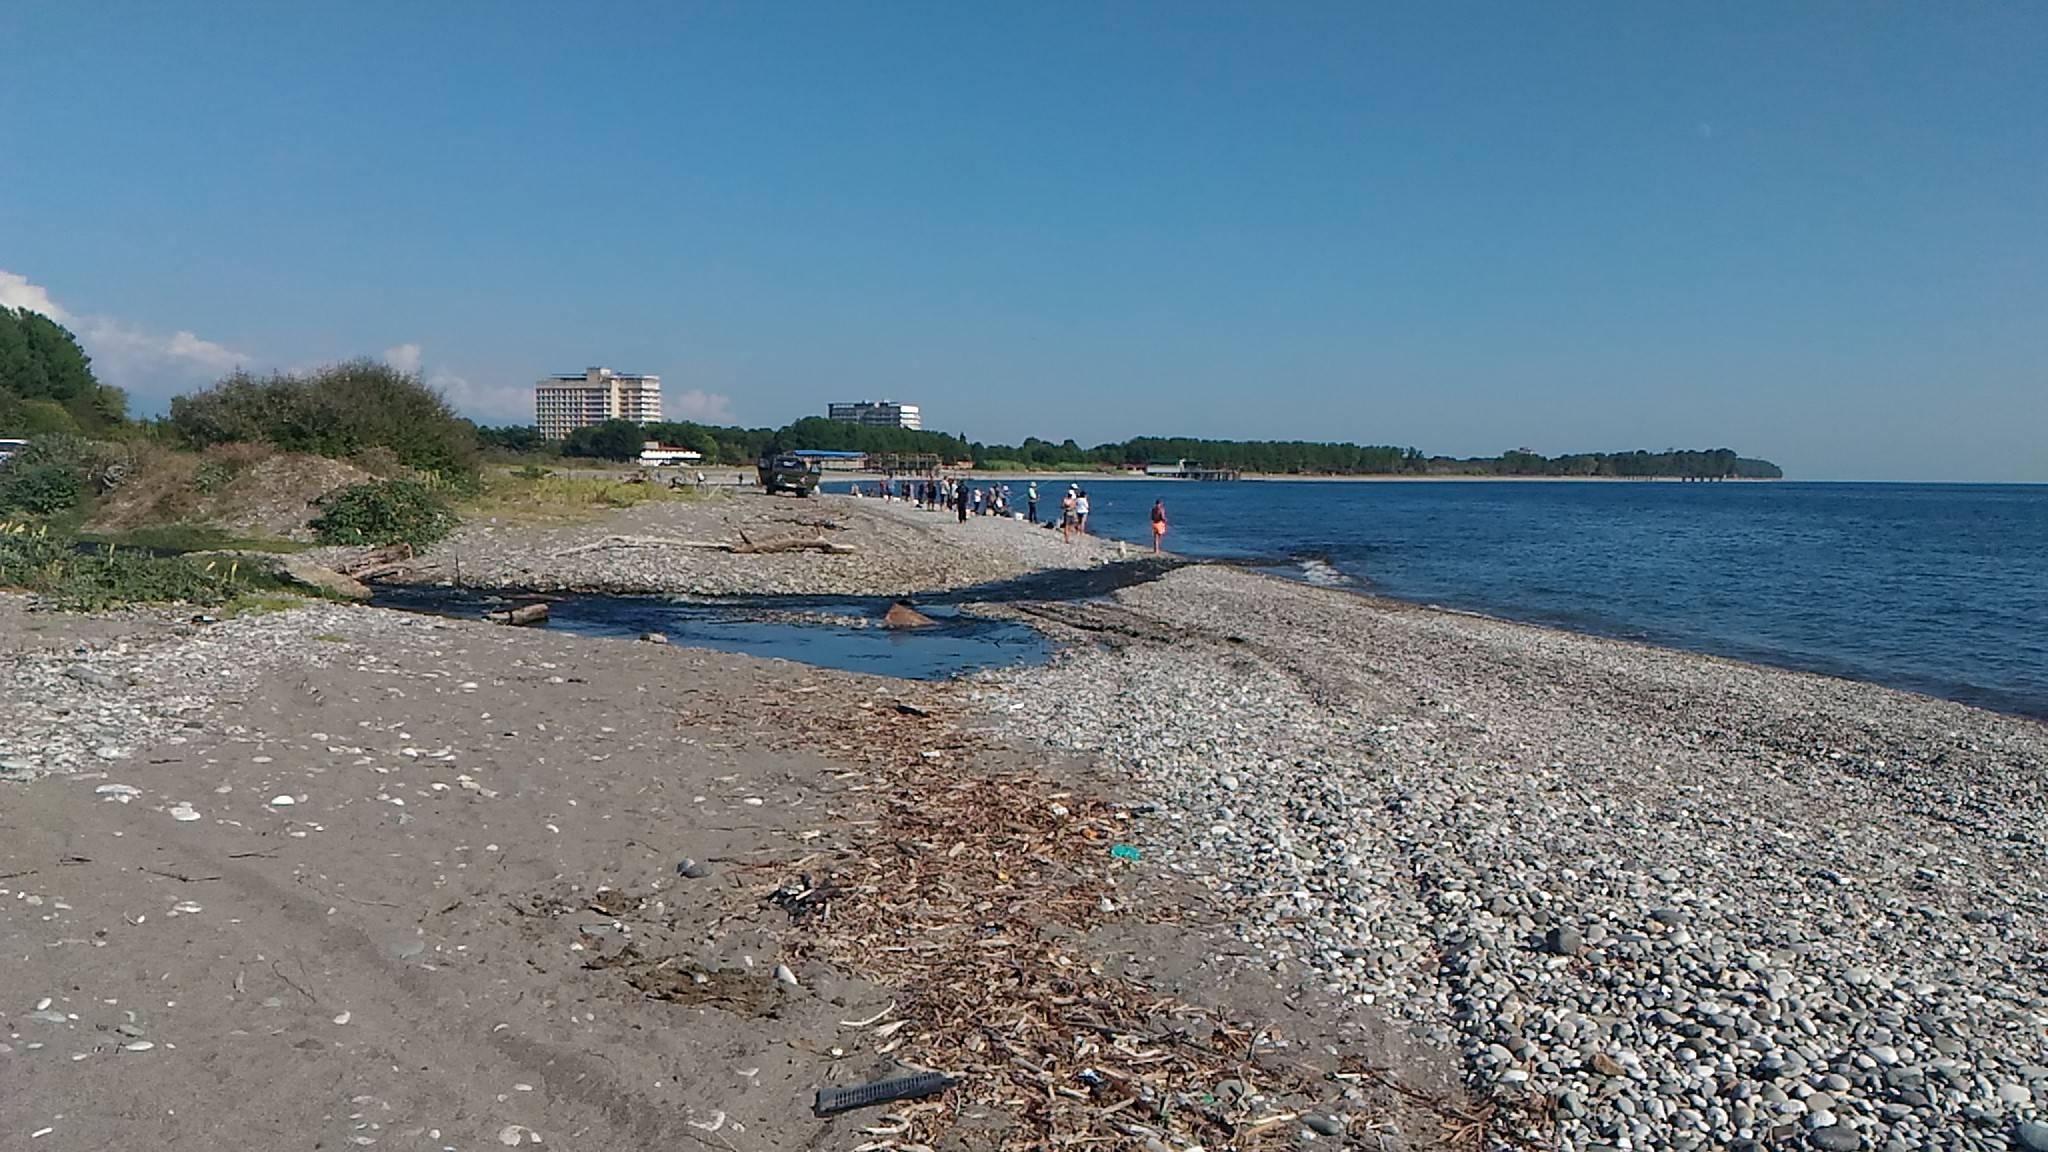 Пансионат литфонд пляж 9